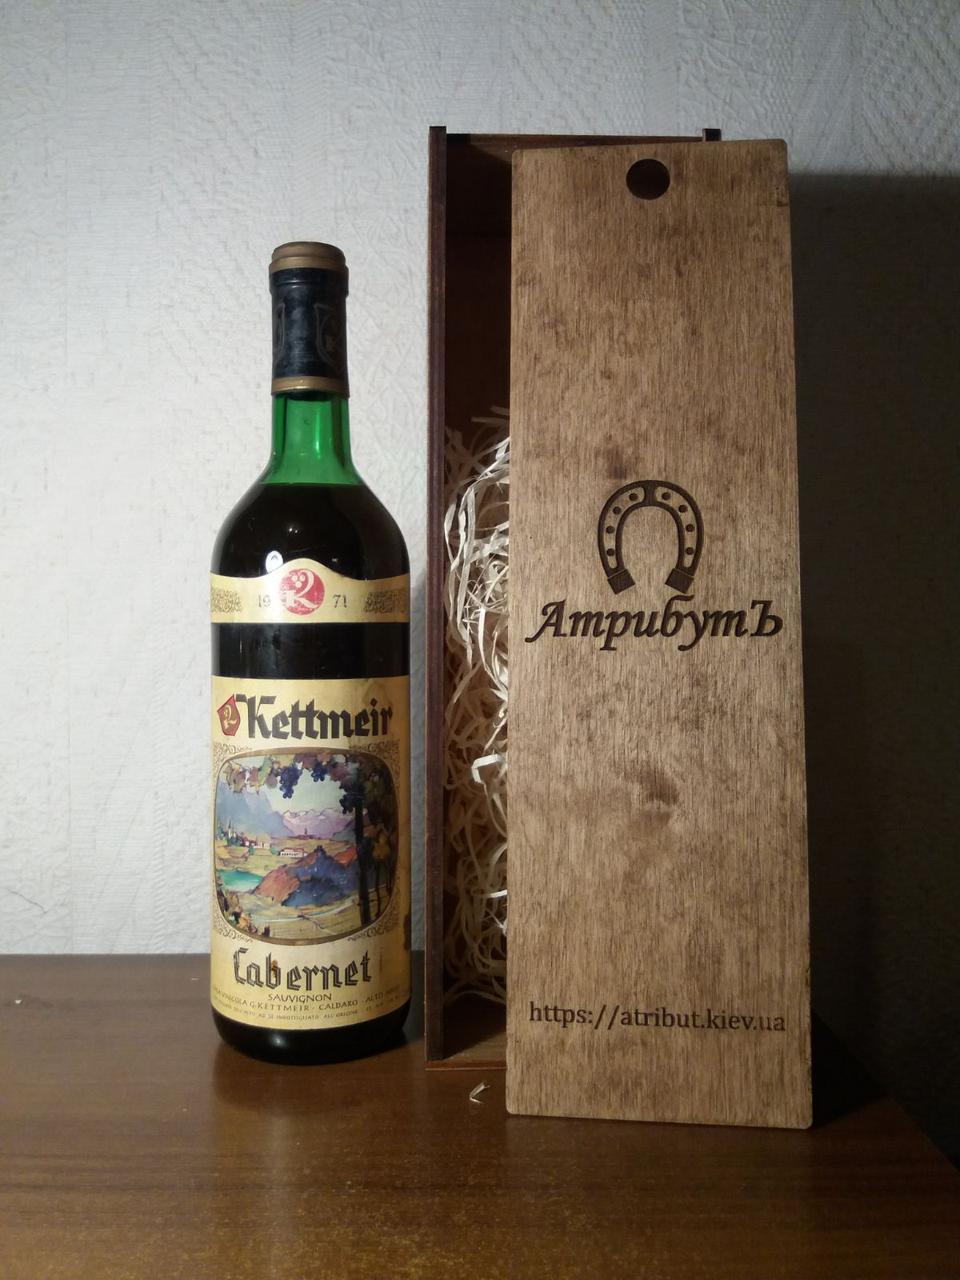 Вино 1971 года Kettmier Cabernet  Италия винтаж